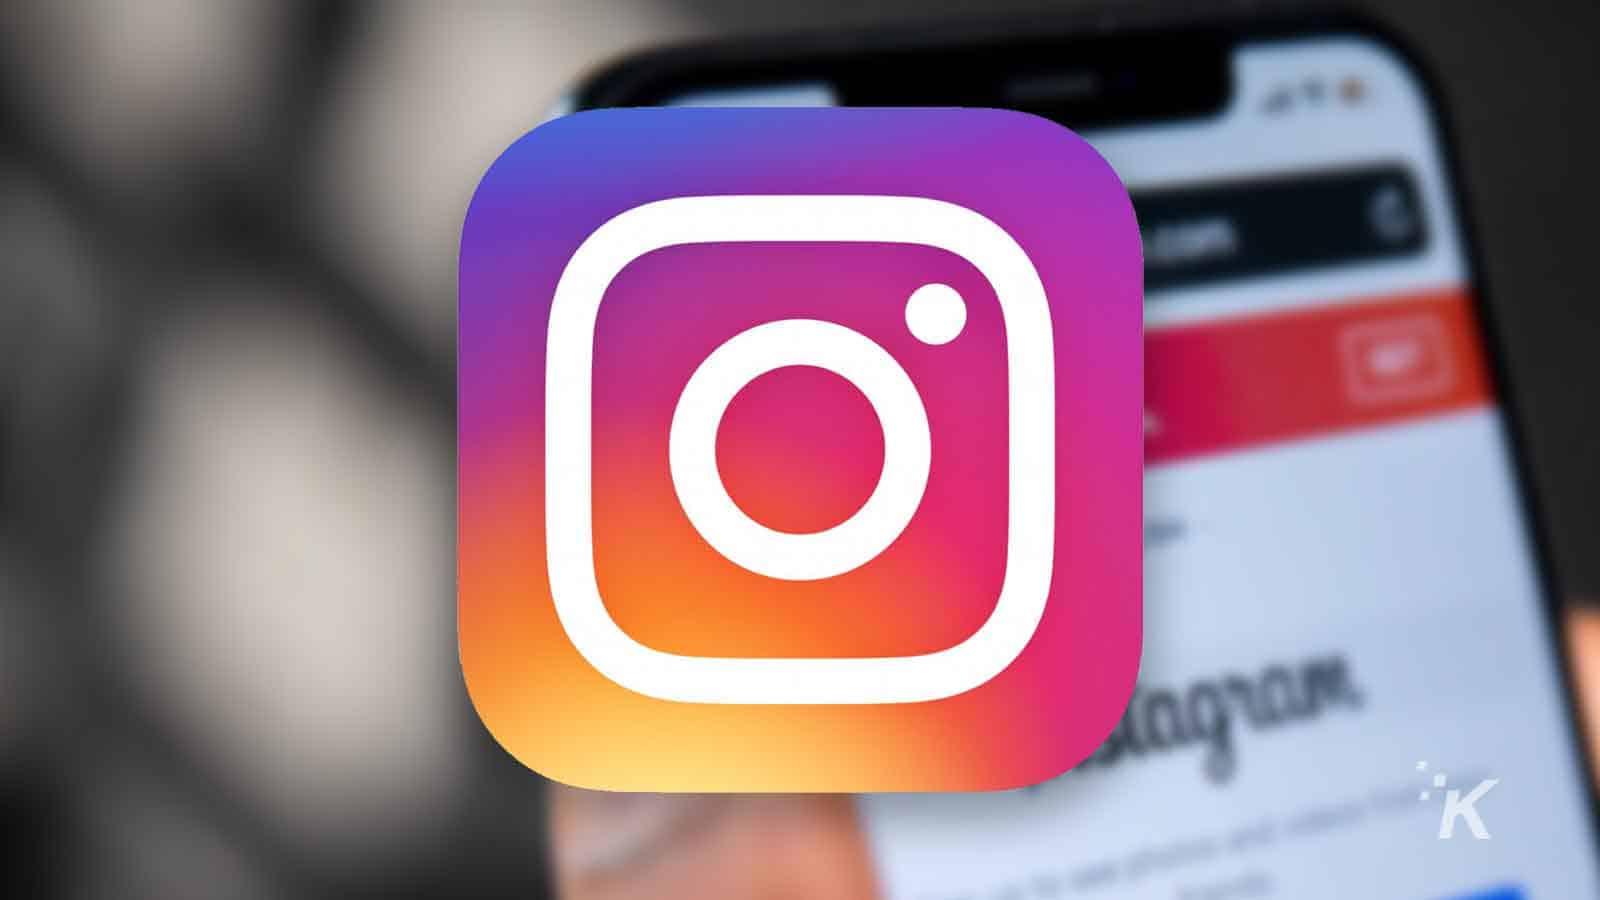 instagram social media logo and blurred background